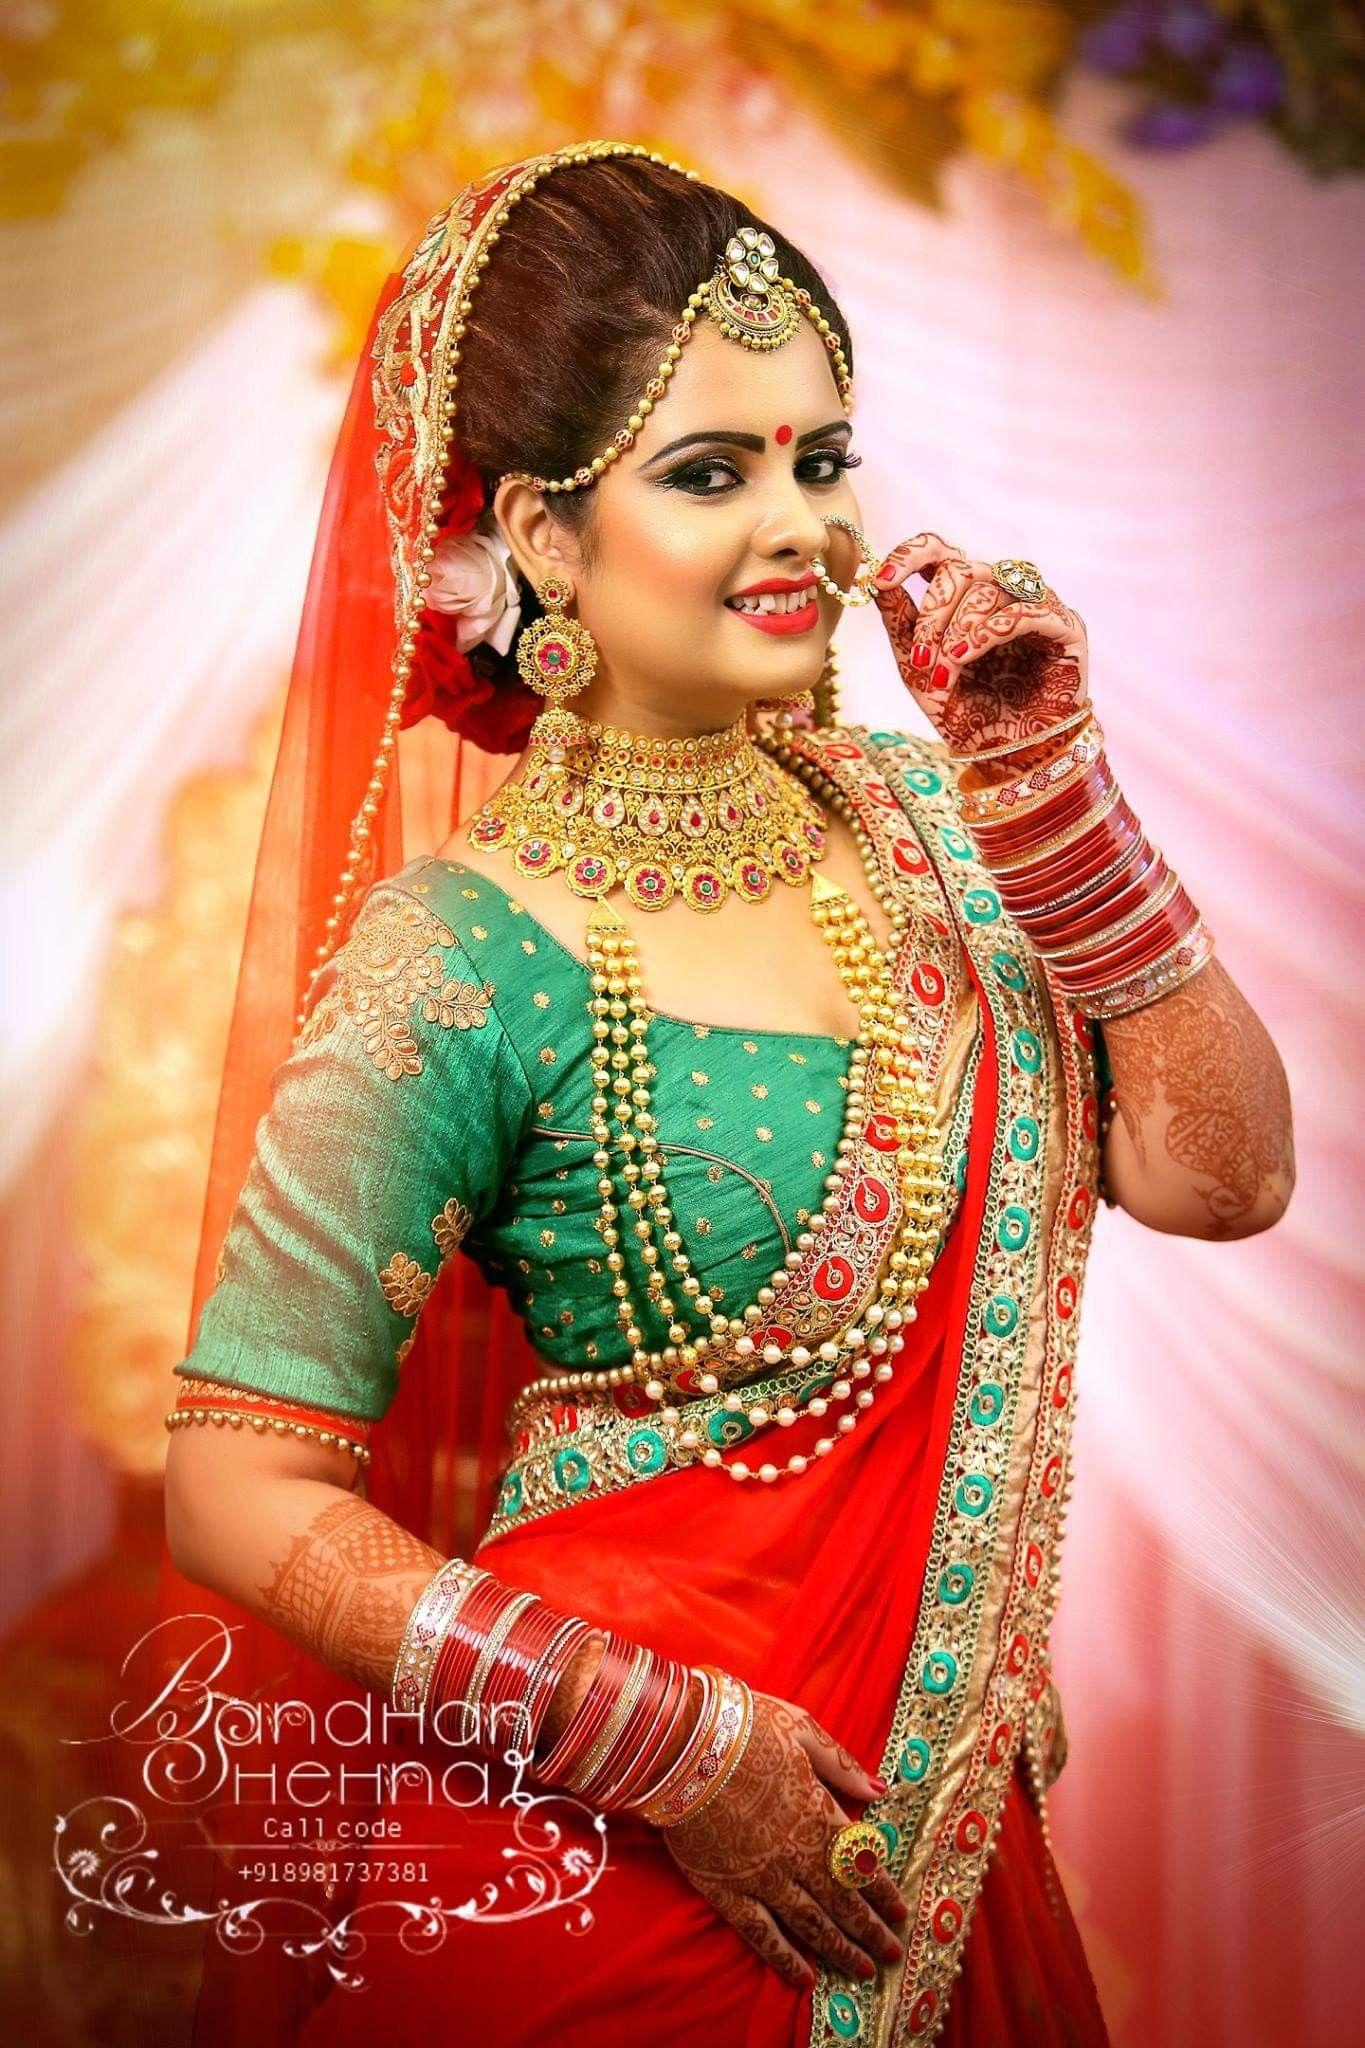 Gold jewelry by Sadaf Naik Bridal photography poses